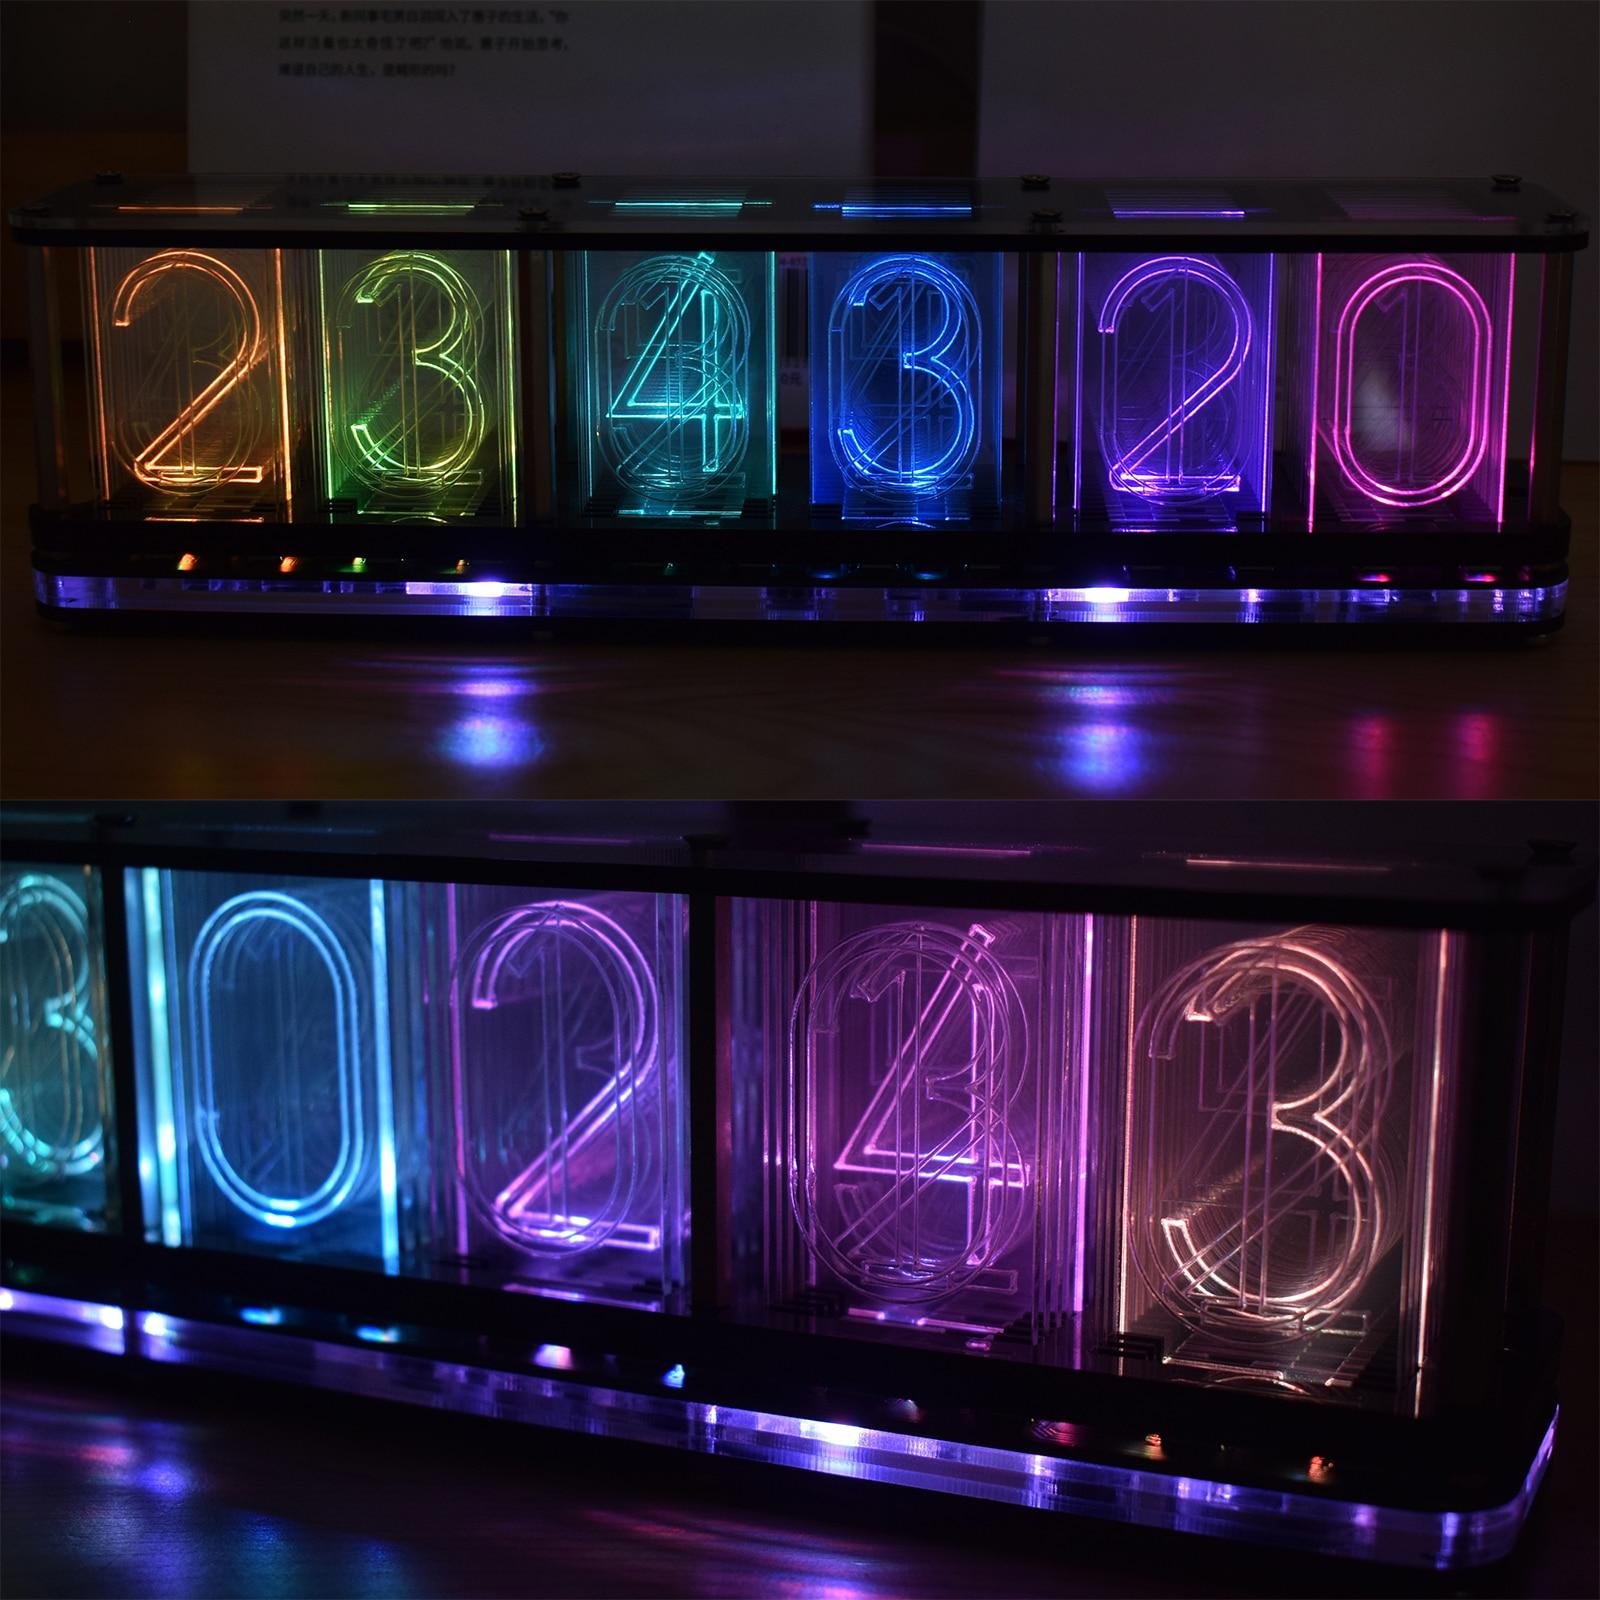 【Big Font】DIY Rainbow RGB Full Color LED Digital Retro Glow Analog Nixie Tube DS3231 Electronic Clock Music Spectrum Display Kit